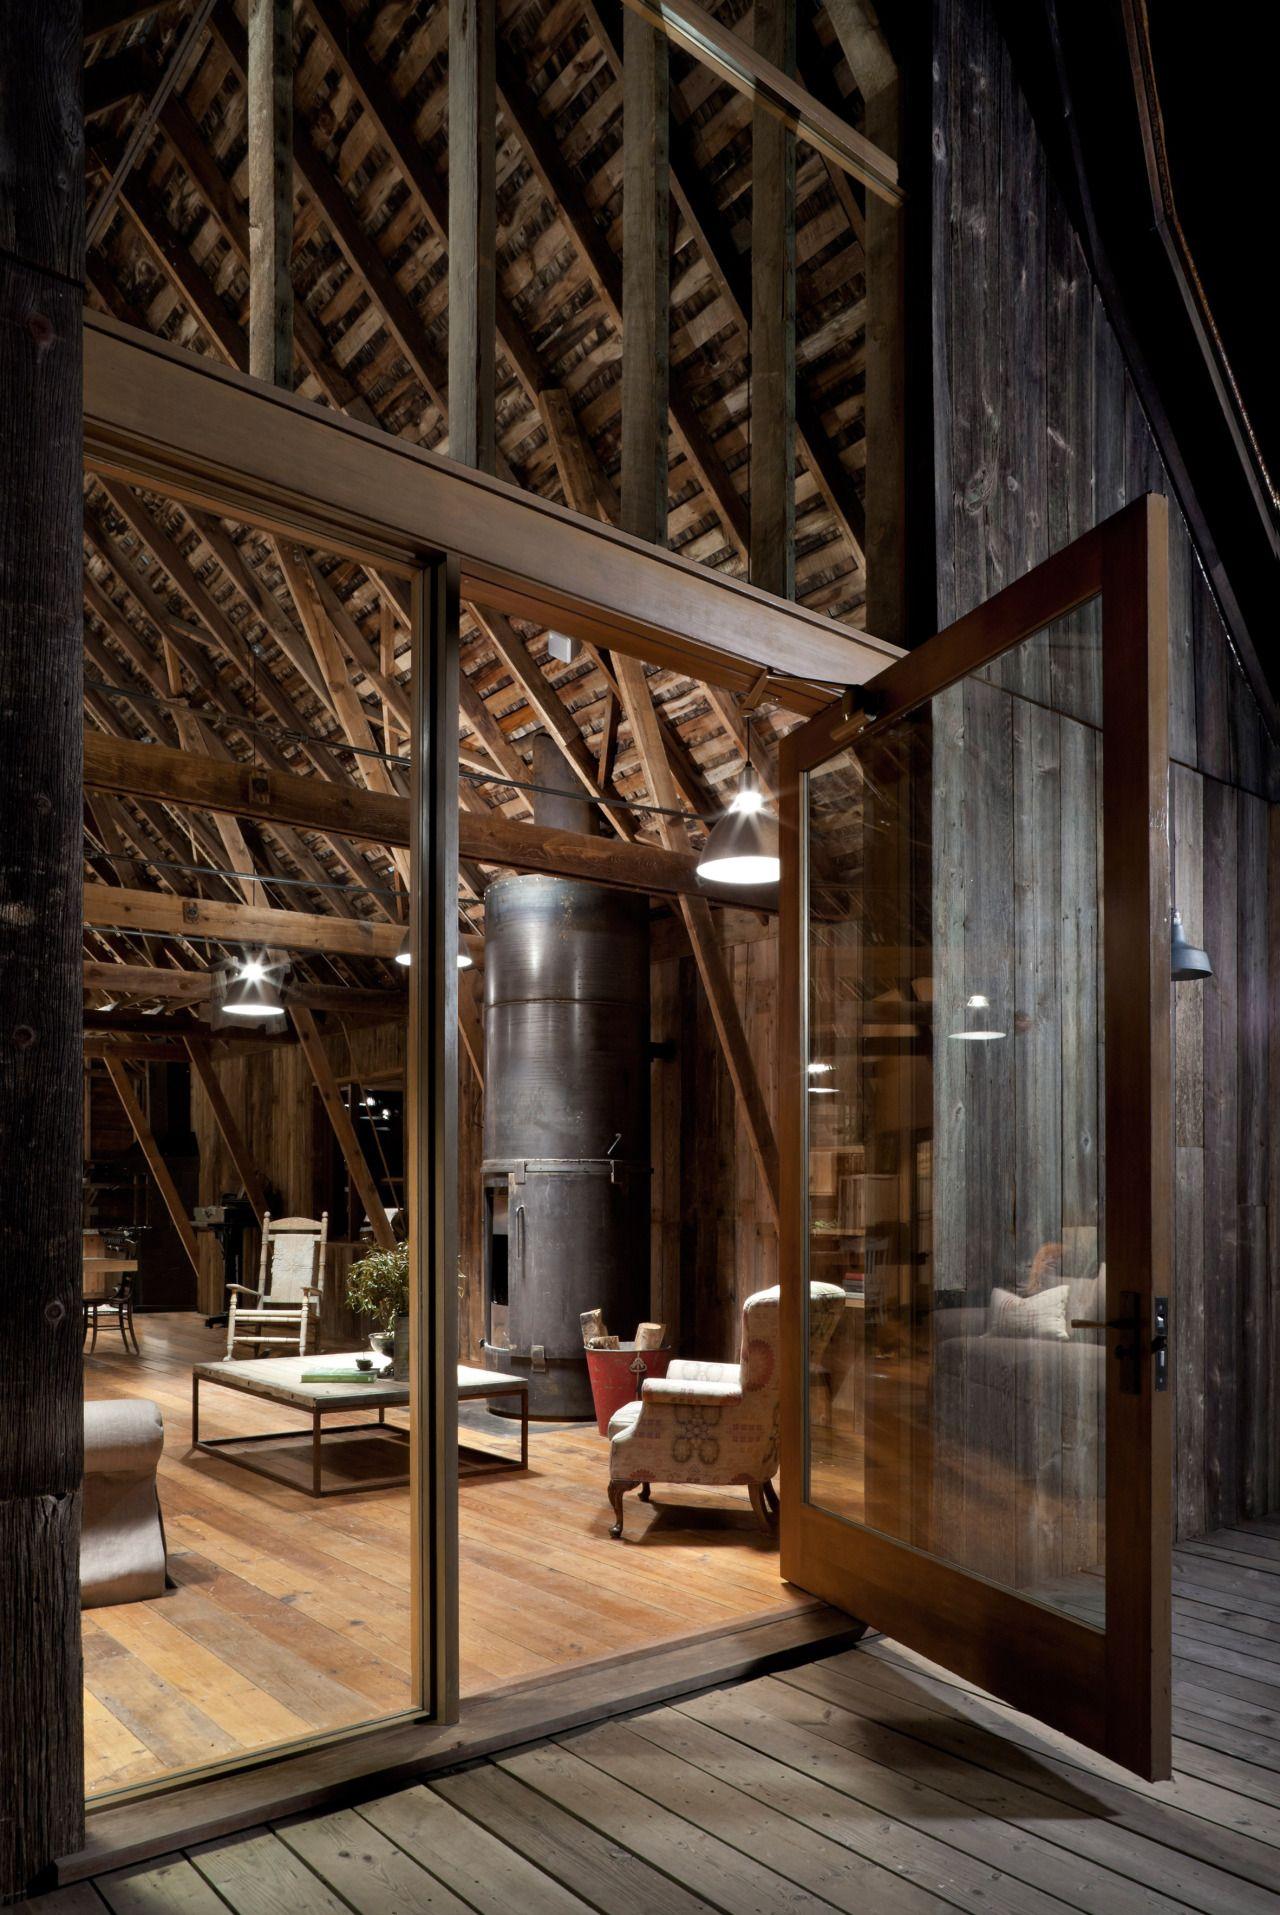 Meer dan 1000 ideeën over loft appartementen op pinterest   lofts ...